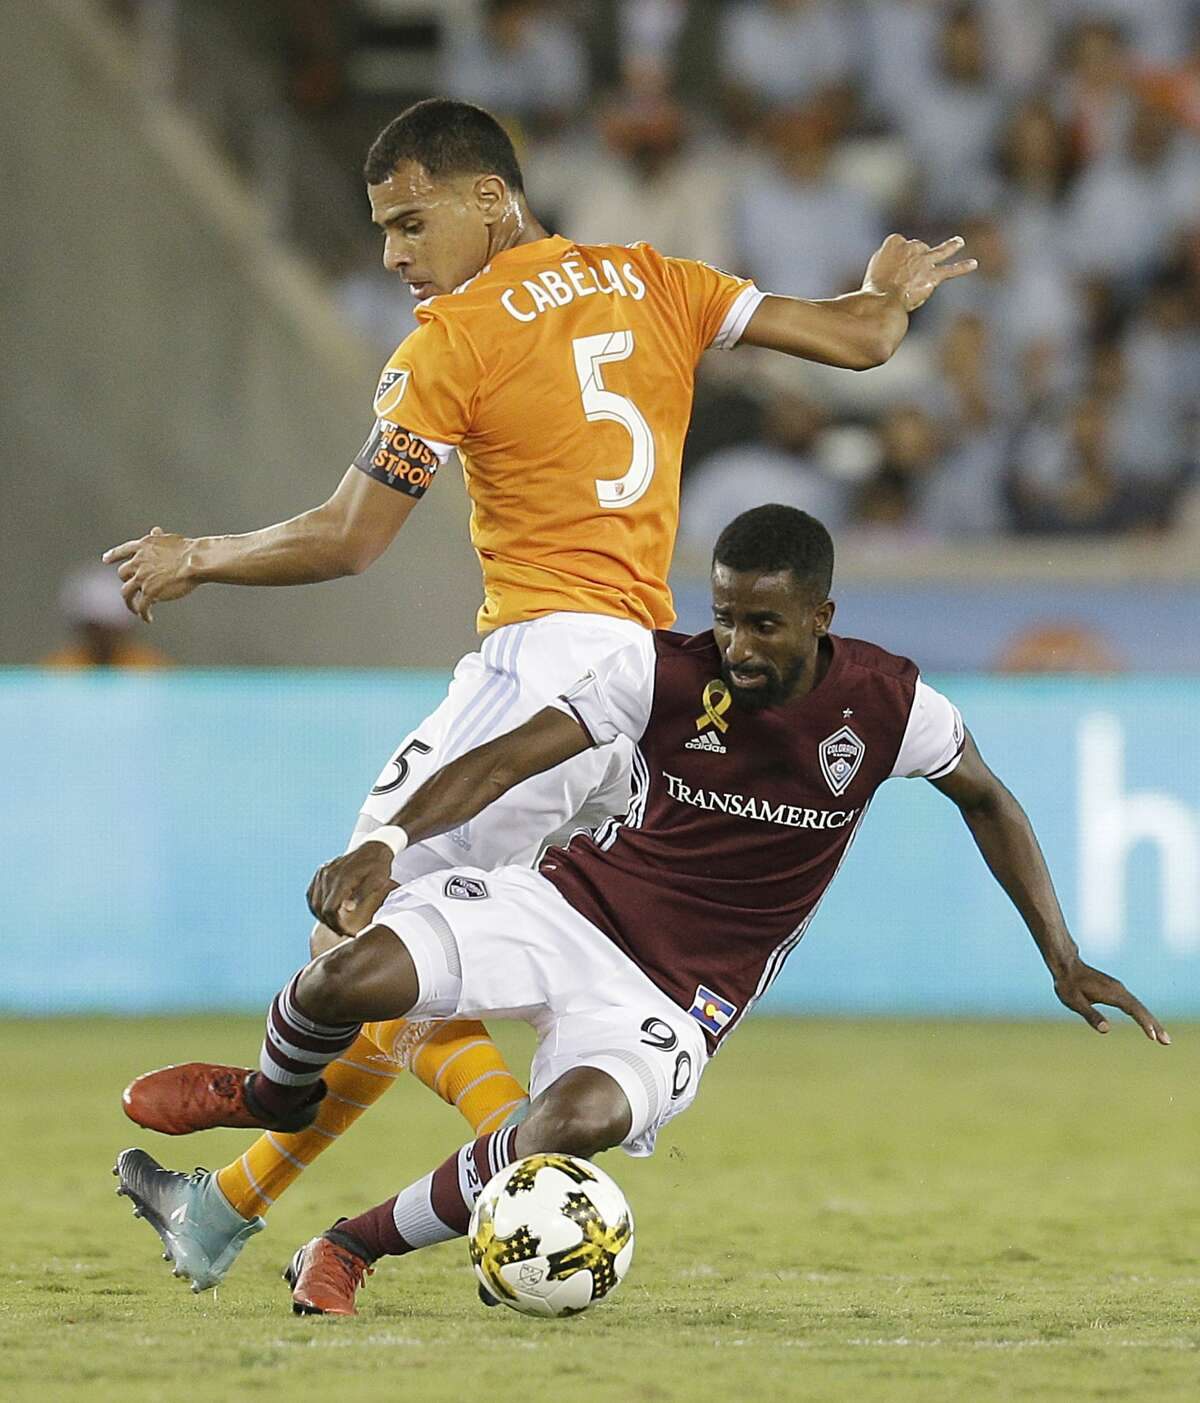 9/9/17: Houston Dynamo midfielder Juan David Cabezas (5) ktrips Colorado Rapids midfielder Mohammed Saeid (90) in the first half in a MLS game at BBVA stadium in Houston, TX